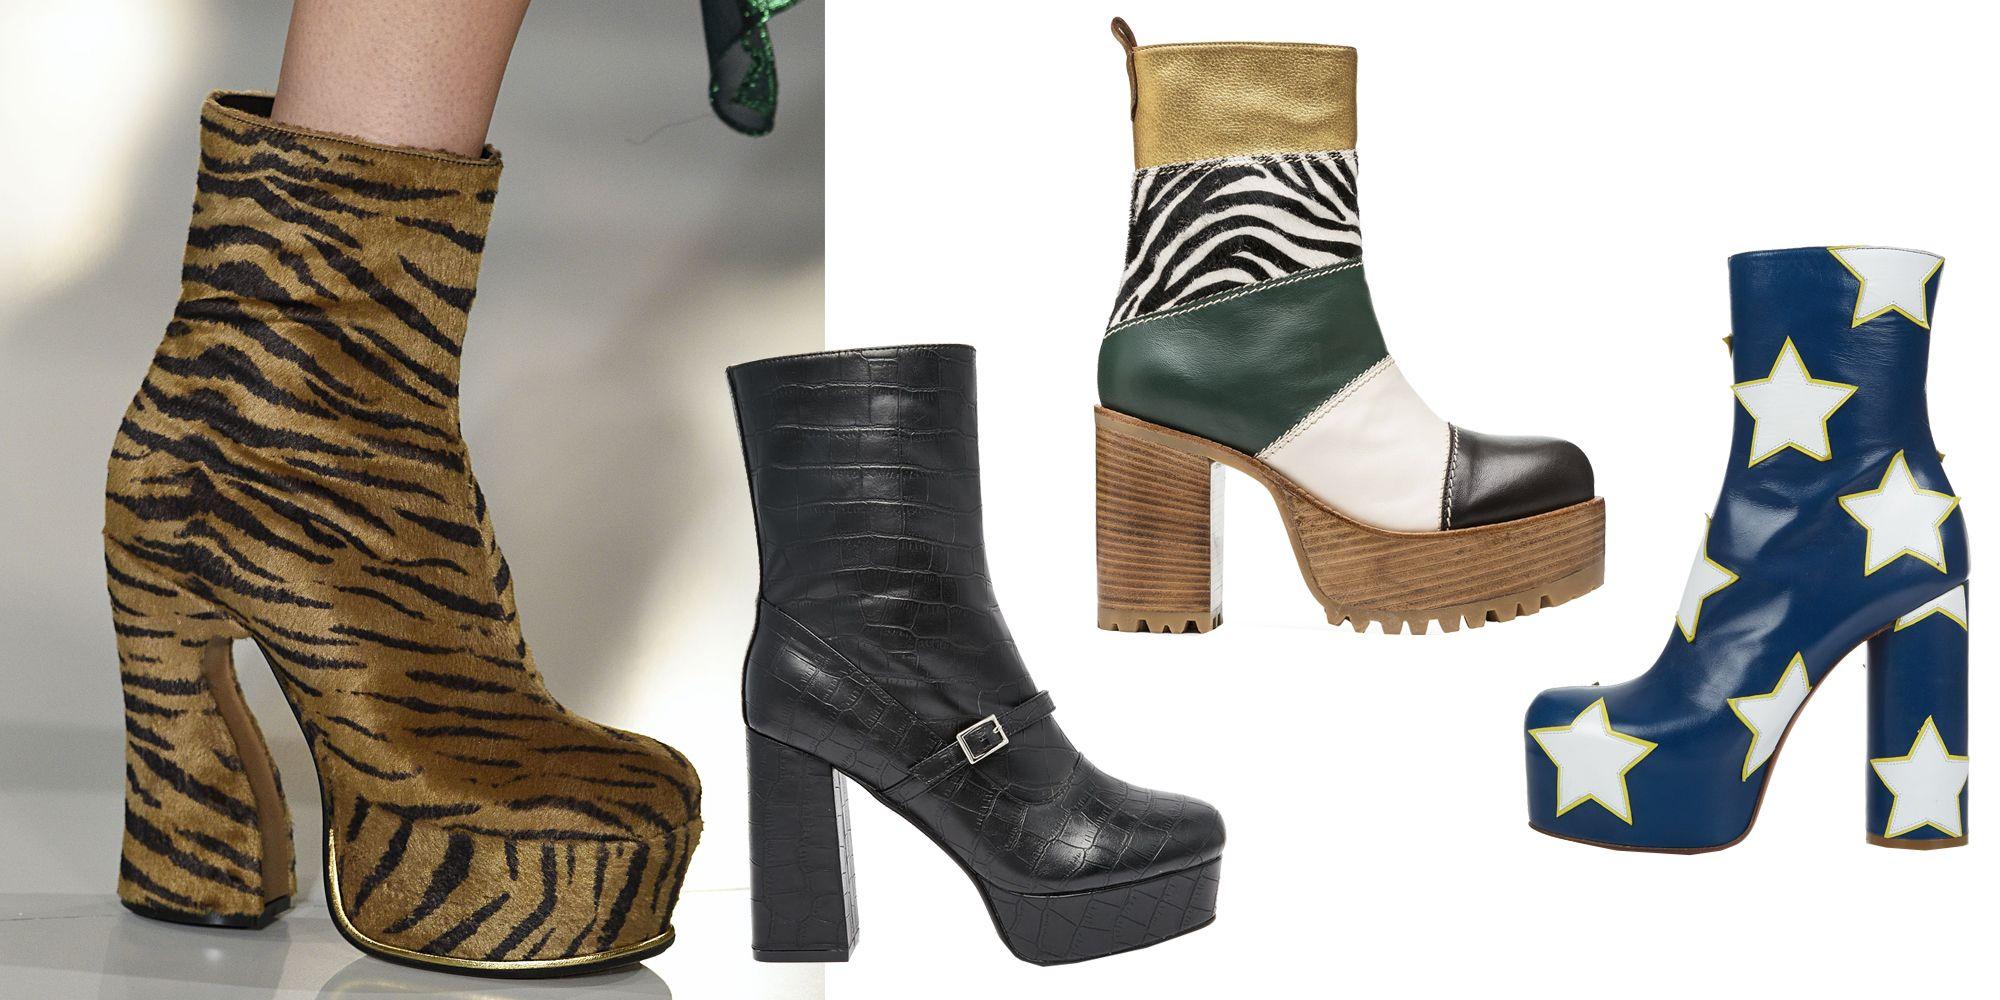 "<p>Truffle Collection Trudy Platform Heeled Ankle Boots, $61; <a href=""http://us.asos.com/Truffle-Collection-Trudy-Platform-Heeled-Ankle-Boots/18n1cc/?iid=5847611&clr=Blackcrocpu&SearchQuery=platform+boots&pgesize=29&pge=0&totalstyles=29&gridsize=3&gridrow=9&gridcolumn=2&mporgp=L3RydWZmbGUtY29sbGVjdGlvbi90cnVmZmxlLWNvbGxlY3Rpb24tdHJ1ZHktcGxhdGZvcm0taGVlbGVkLWFua2xlLWJvb3RzL3Byb2Qv"" target=""_blank"">asos.com</a></p><p>Marni Ankle Boot, $1,250; <a href=""http://www.marni.com/us/ankle-boot_cod44910225kh.html"" target=""_blank"">marni.com</a></p><p>Vetements Stars Leather Platform Boots, $2,450; <a href=""http://www.matchesfashion.com/us/products/1049742?country=USA&LGWCODE=1049742000013;104033;6167&visitor_id=-_-1918465066-_-v2&gclid=CJq3iunjwMsCFUI6gQod4AcOag&qxjkl=tsid%3A75618%7Ccid%3A275295246%7Cagid%3A17618766846%7Ctid%3Apla-163031420646%7Ccrid%3A66843436926%7Cnw%3Ag%7Crnd%3A8525538313500475876%7Cdvc%3Ac%7Cadp%3A1o3"" target=""_blank"">matchesfashion.com</a></p>"